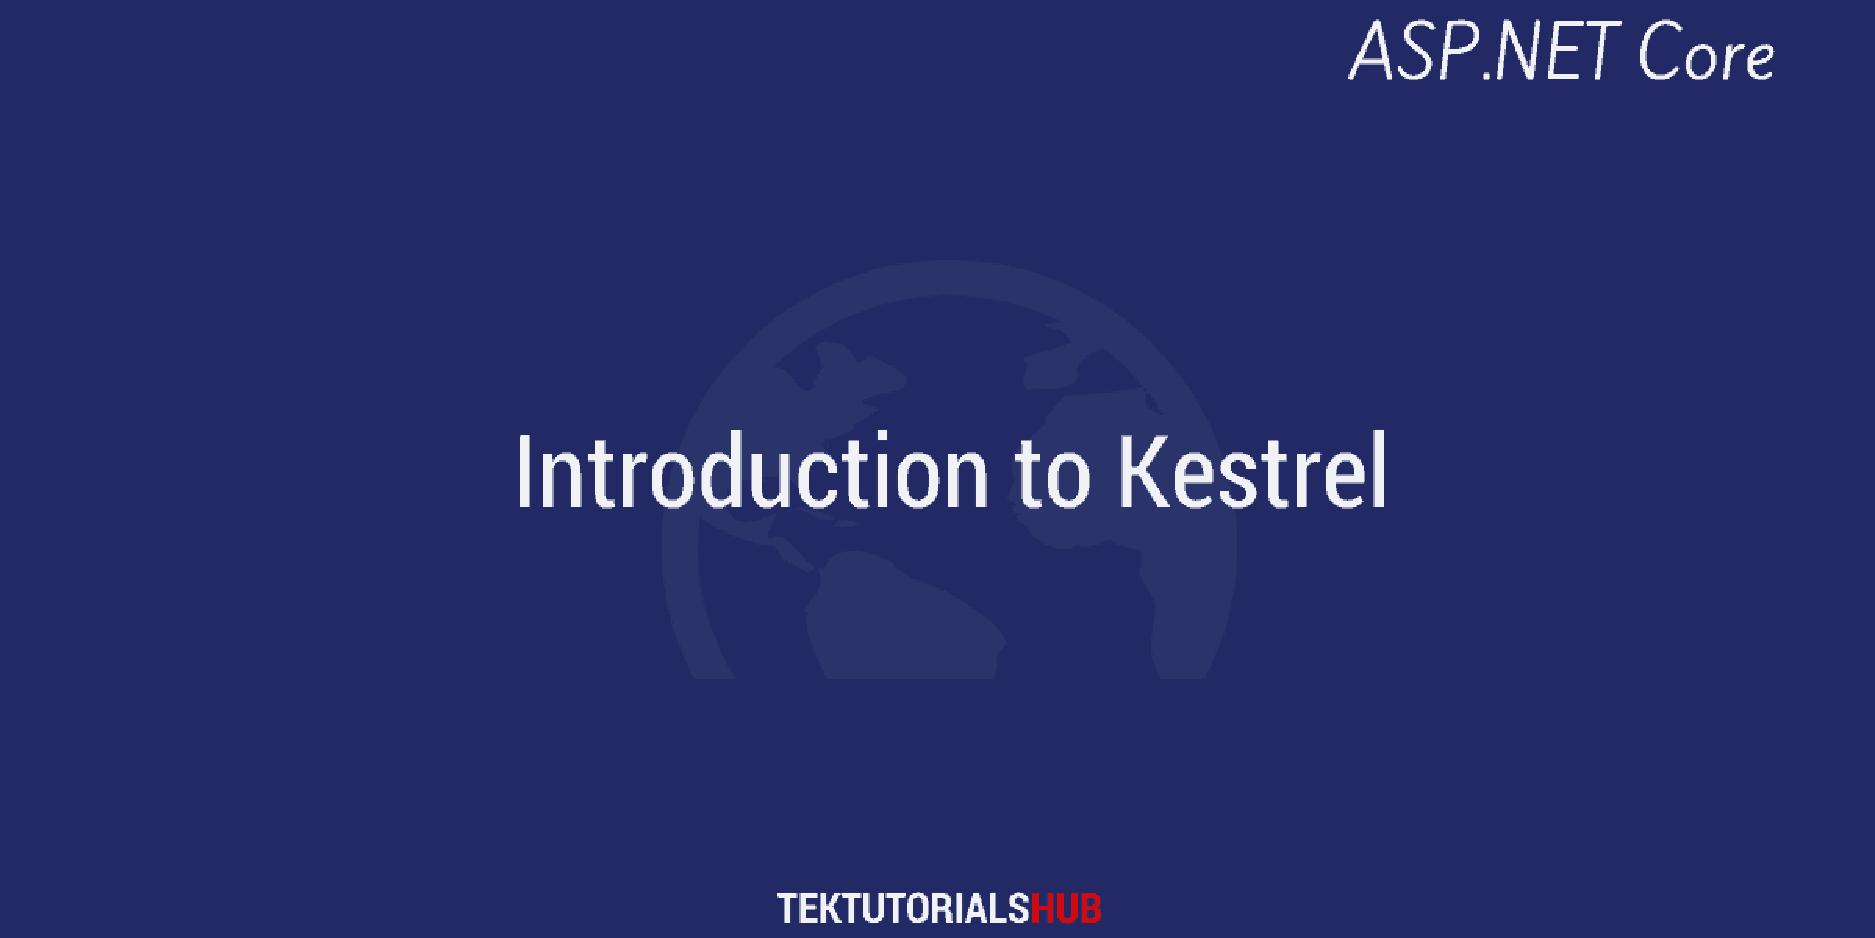 Kestrel: Web Server for ASP.NET Core - TekTutorialsHub